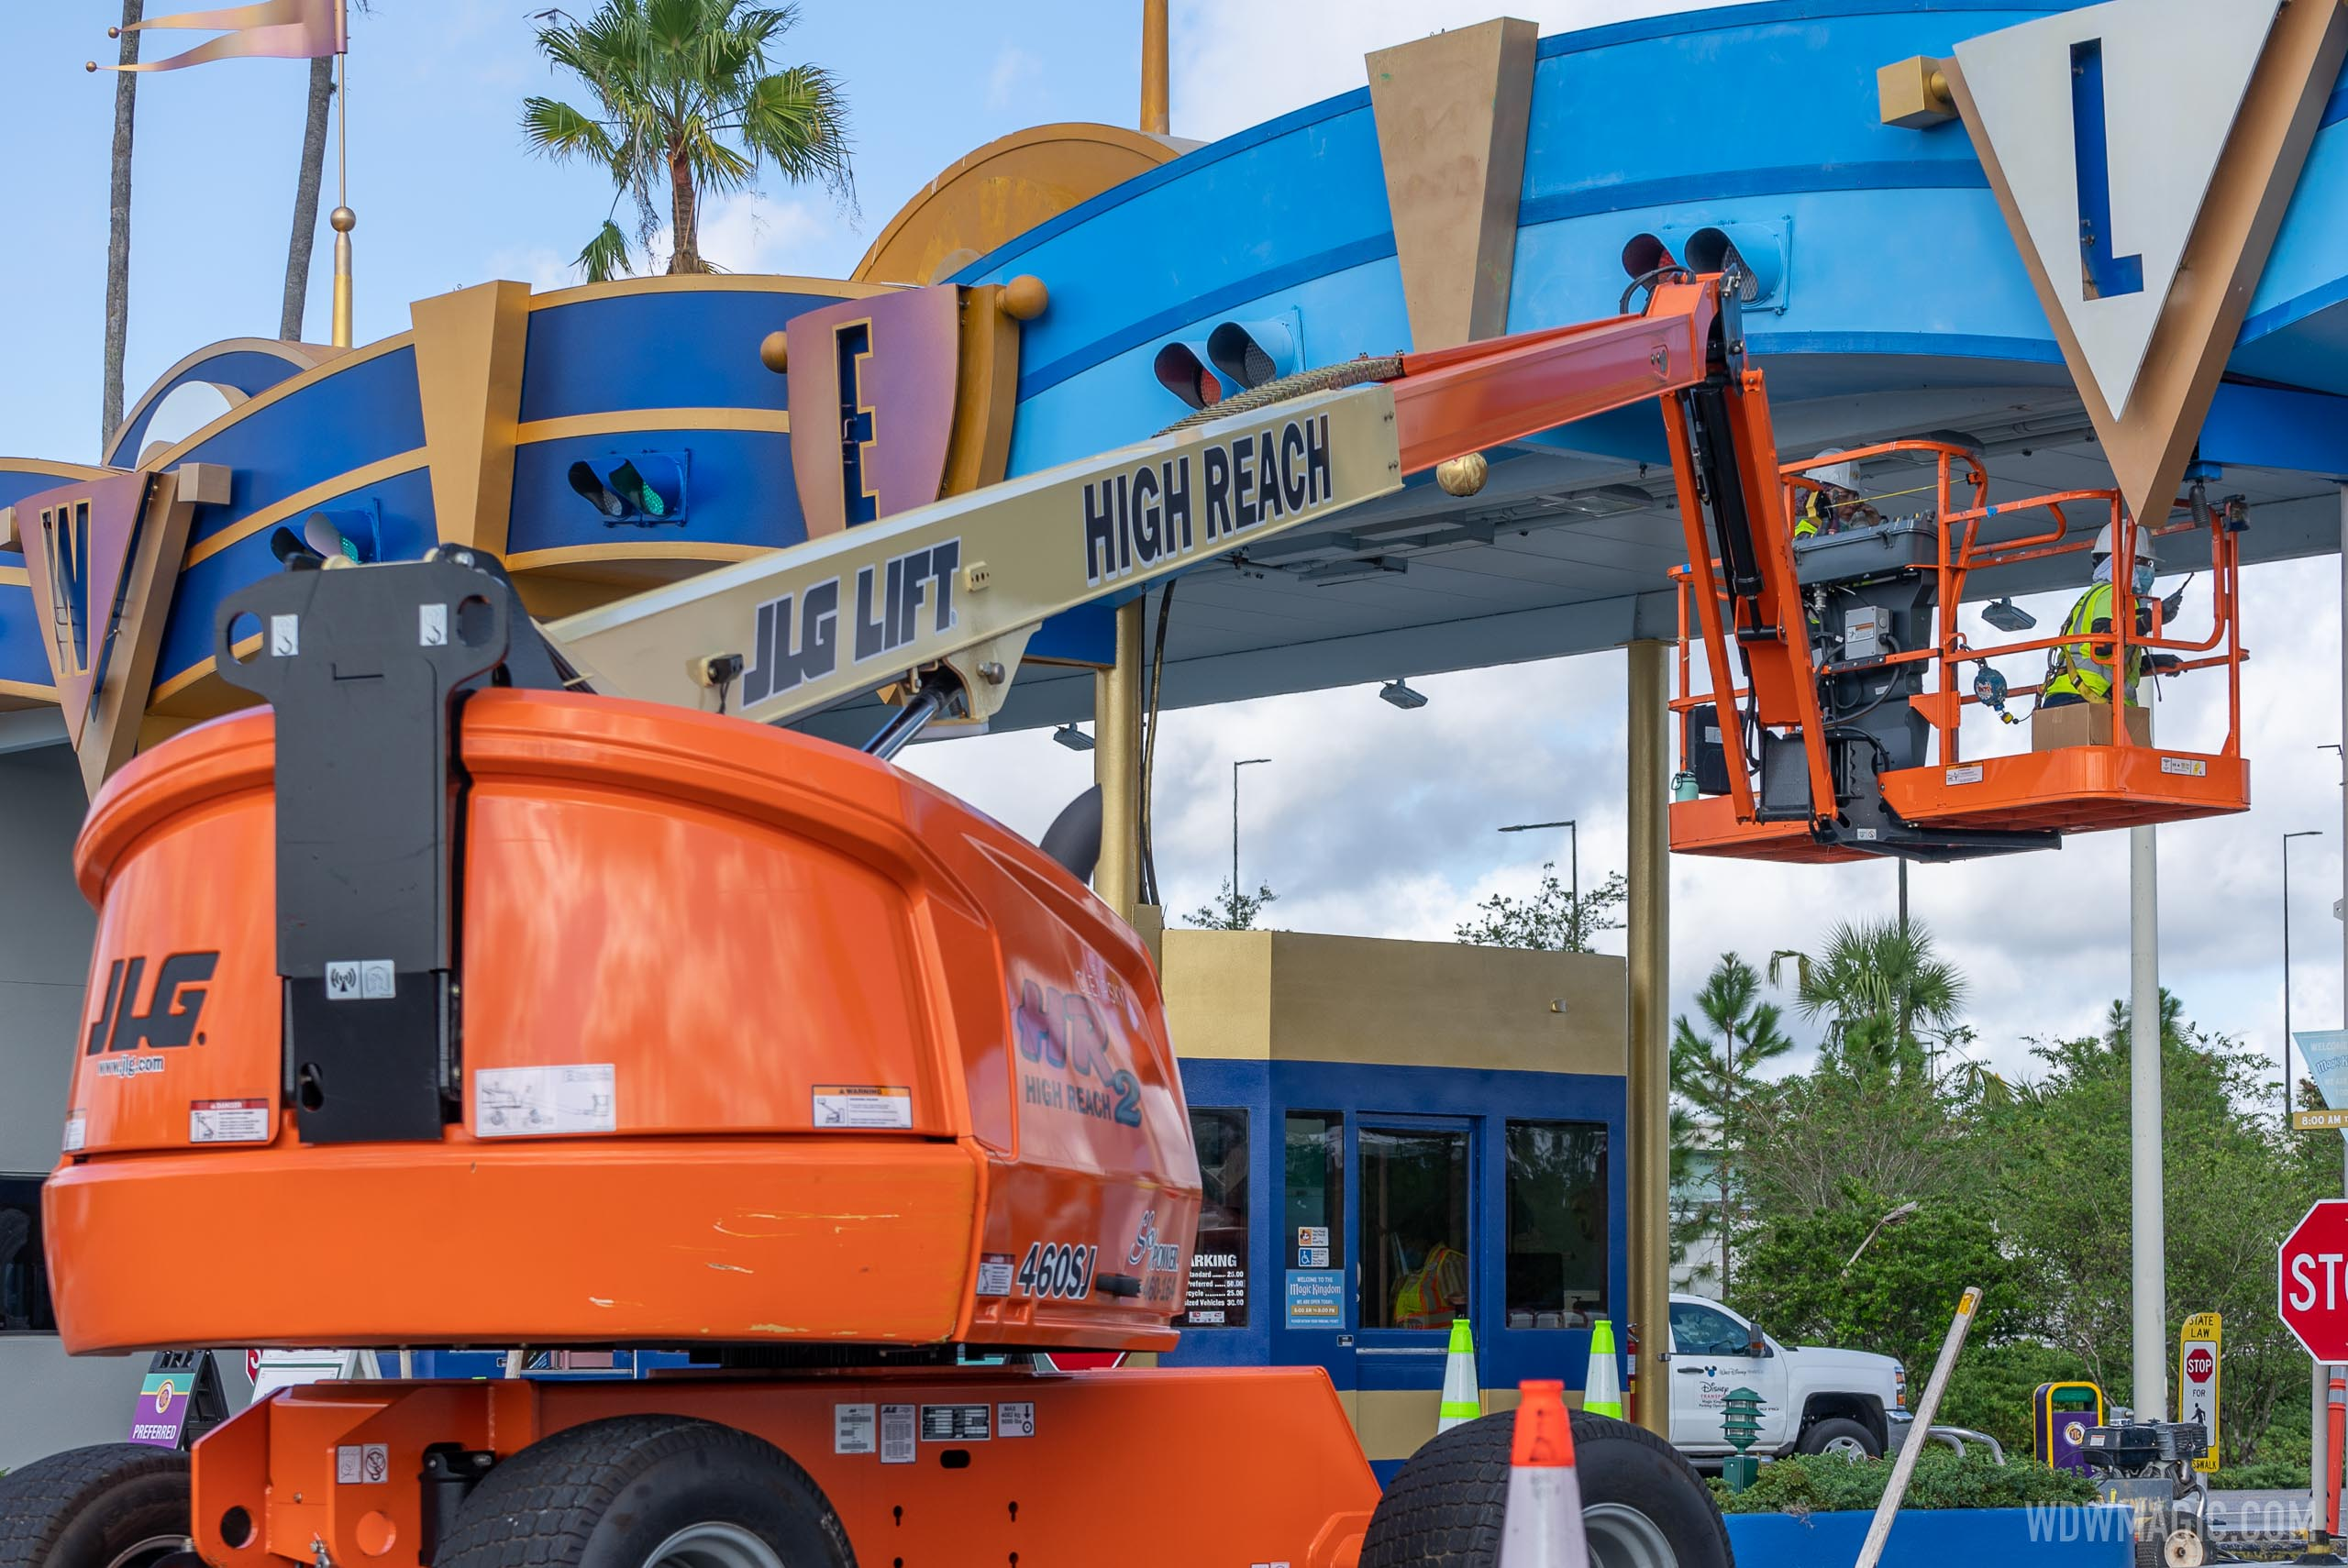 Crews working on the Magic Kingdom auto-plaza